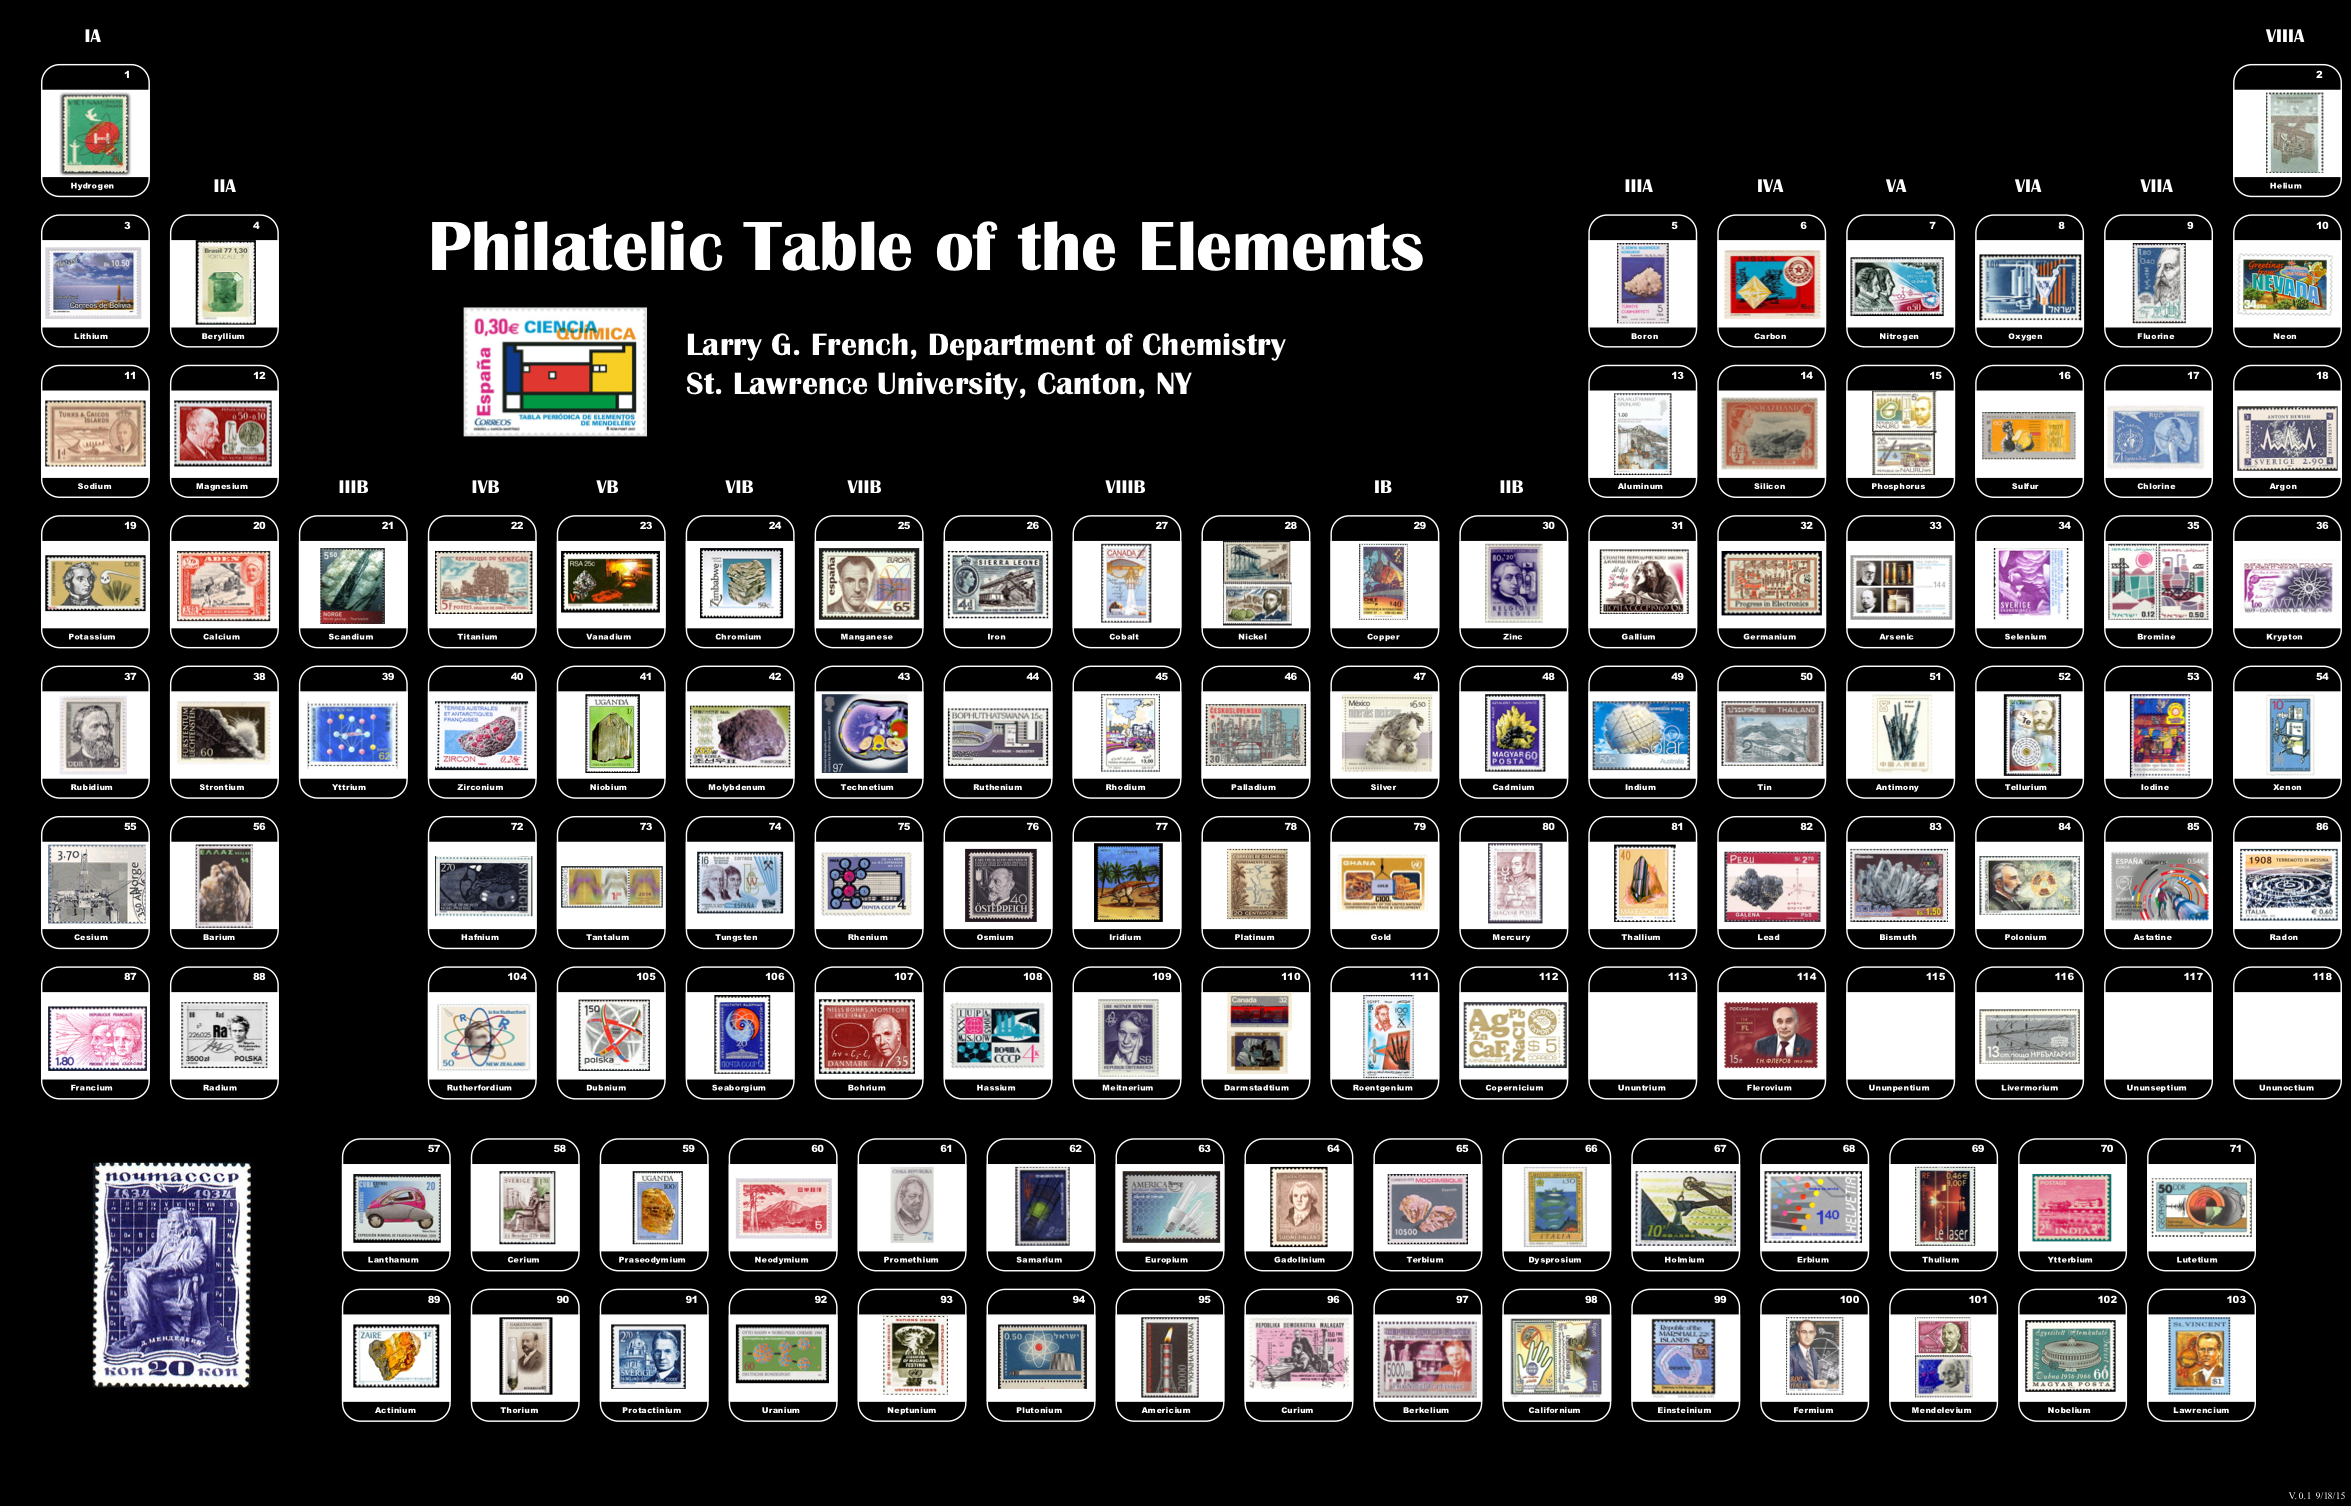 Periodic table database chemogenesis philatelic periodic table gamestrikefo Image collections